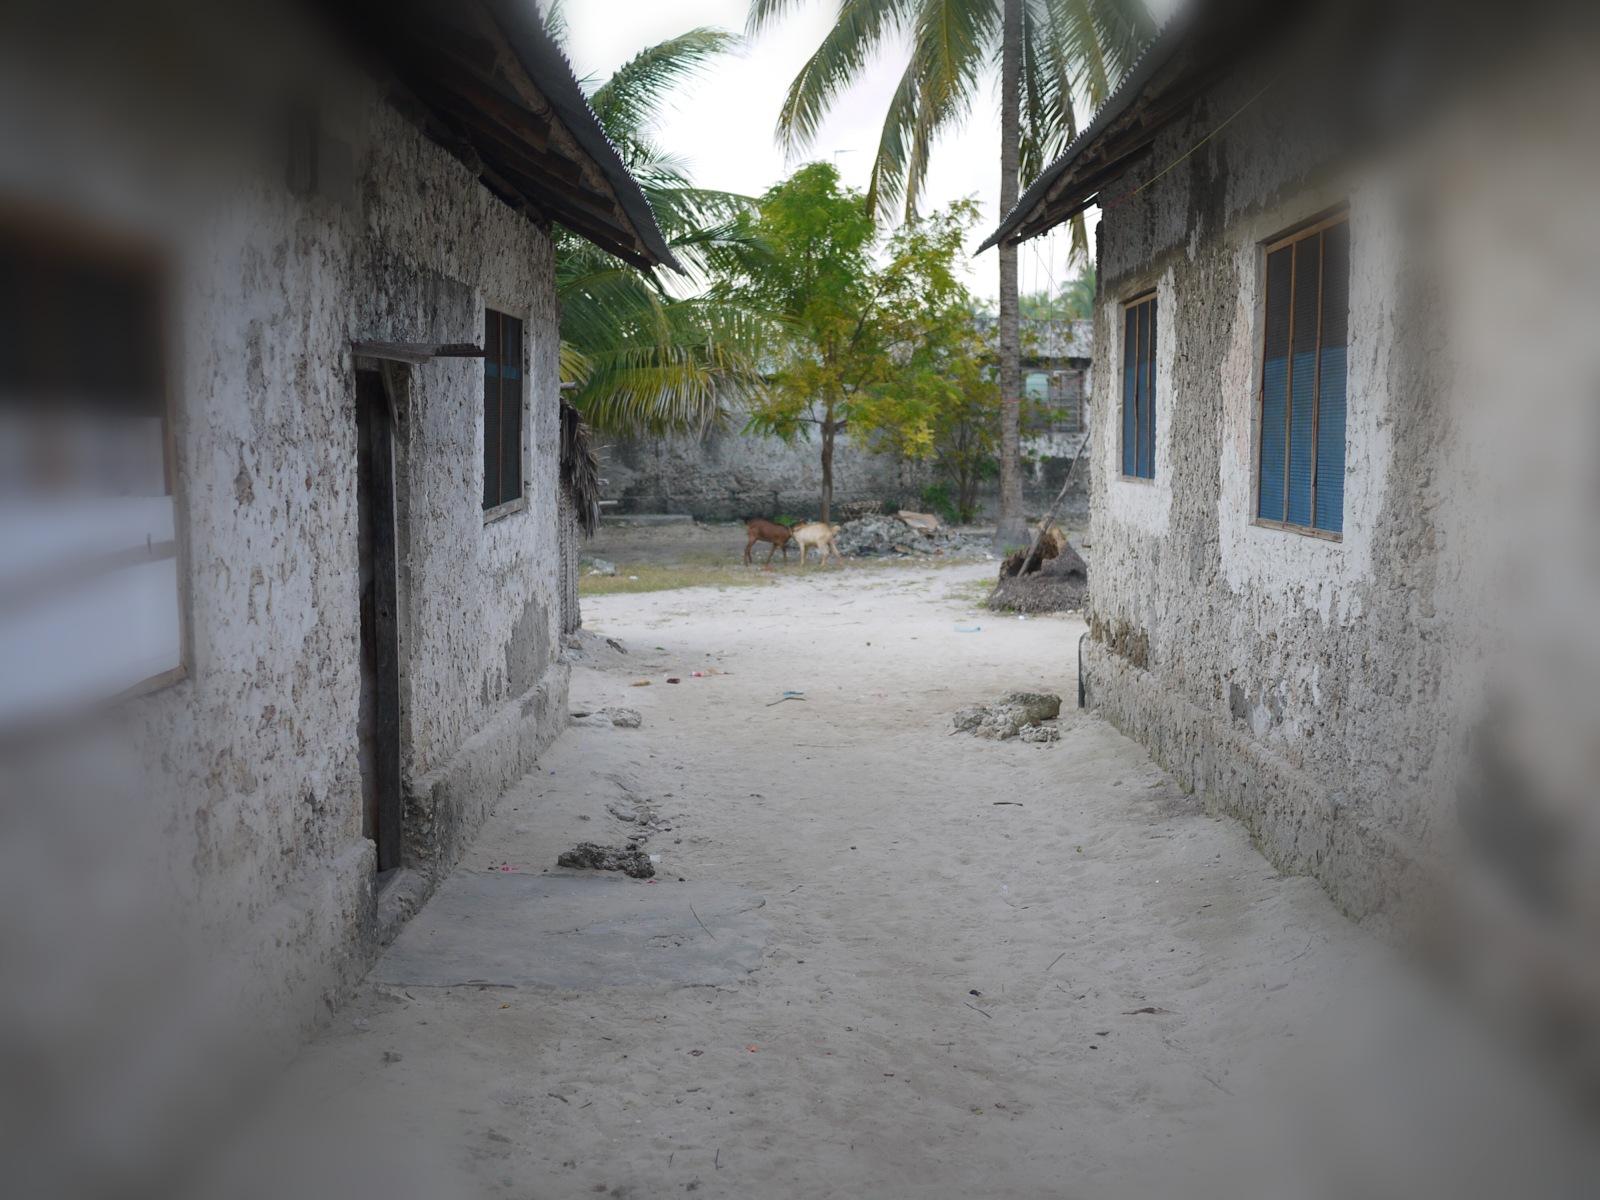 Jambiani Village by shorty123